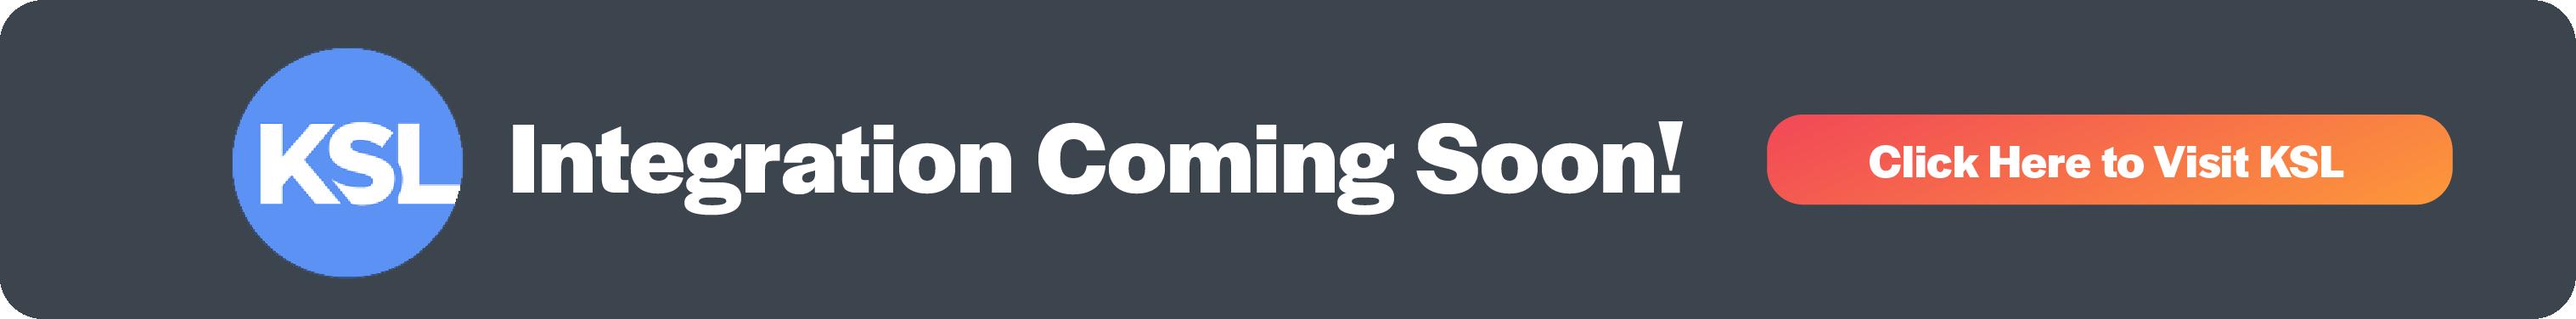 KSL Integration Coming Soon! Click Here!